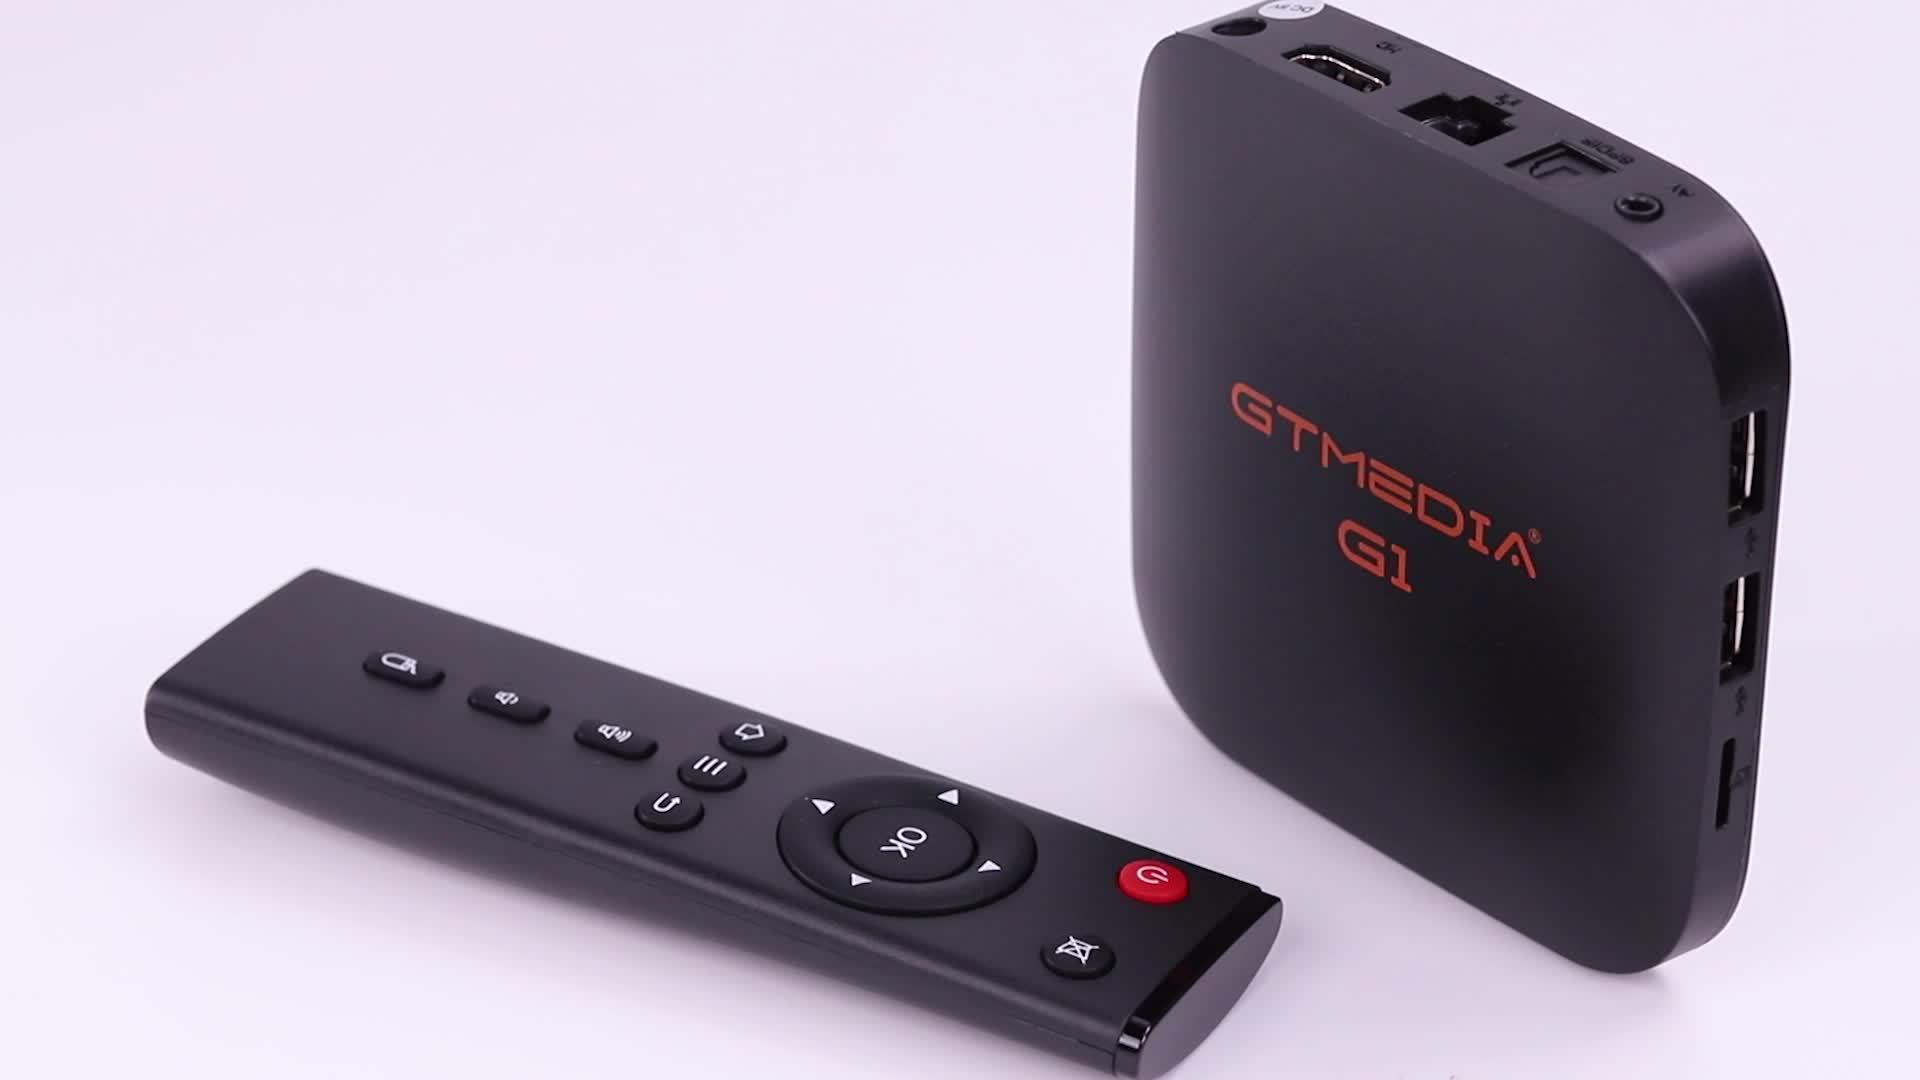 China Hersteller Beste Android TV Box 2019 RJ45 Kabel Netzwerk Verbindung MPEG 4 Decoder Smart TV Receiver